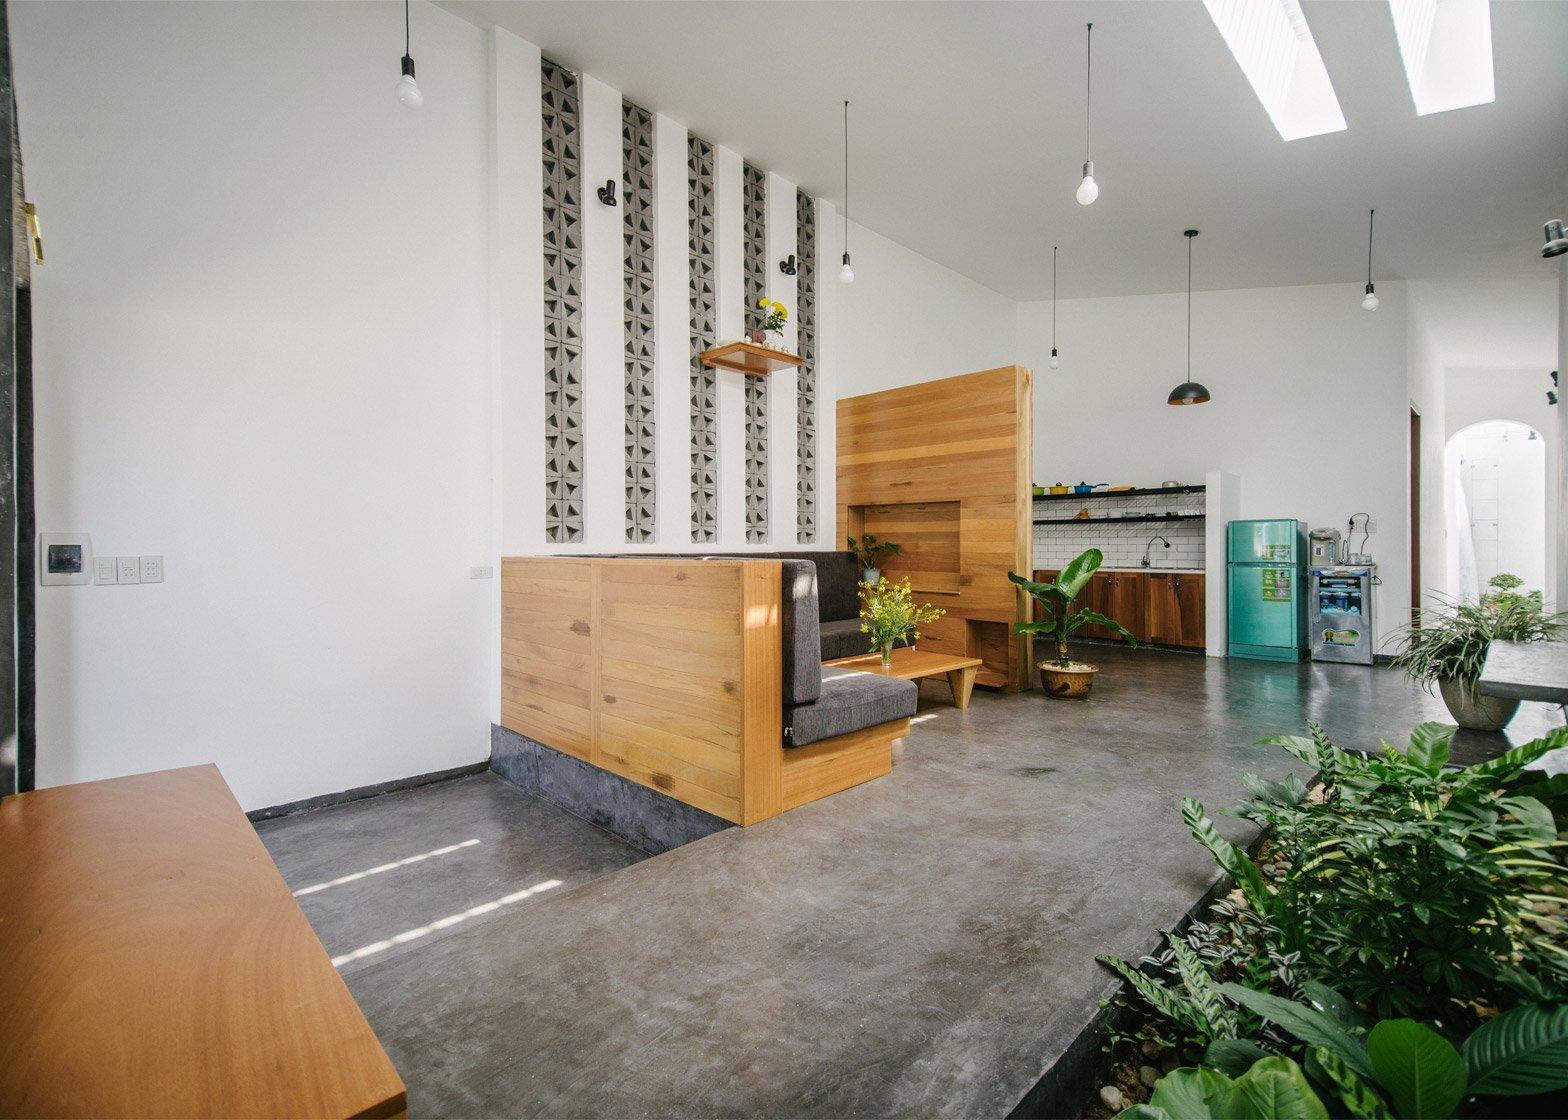 Kontum House - Khuon Studio - Vietnam - Kitchen and Living Area - Humble Homes